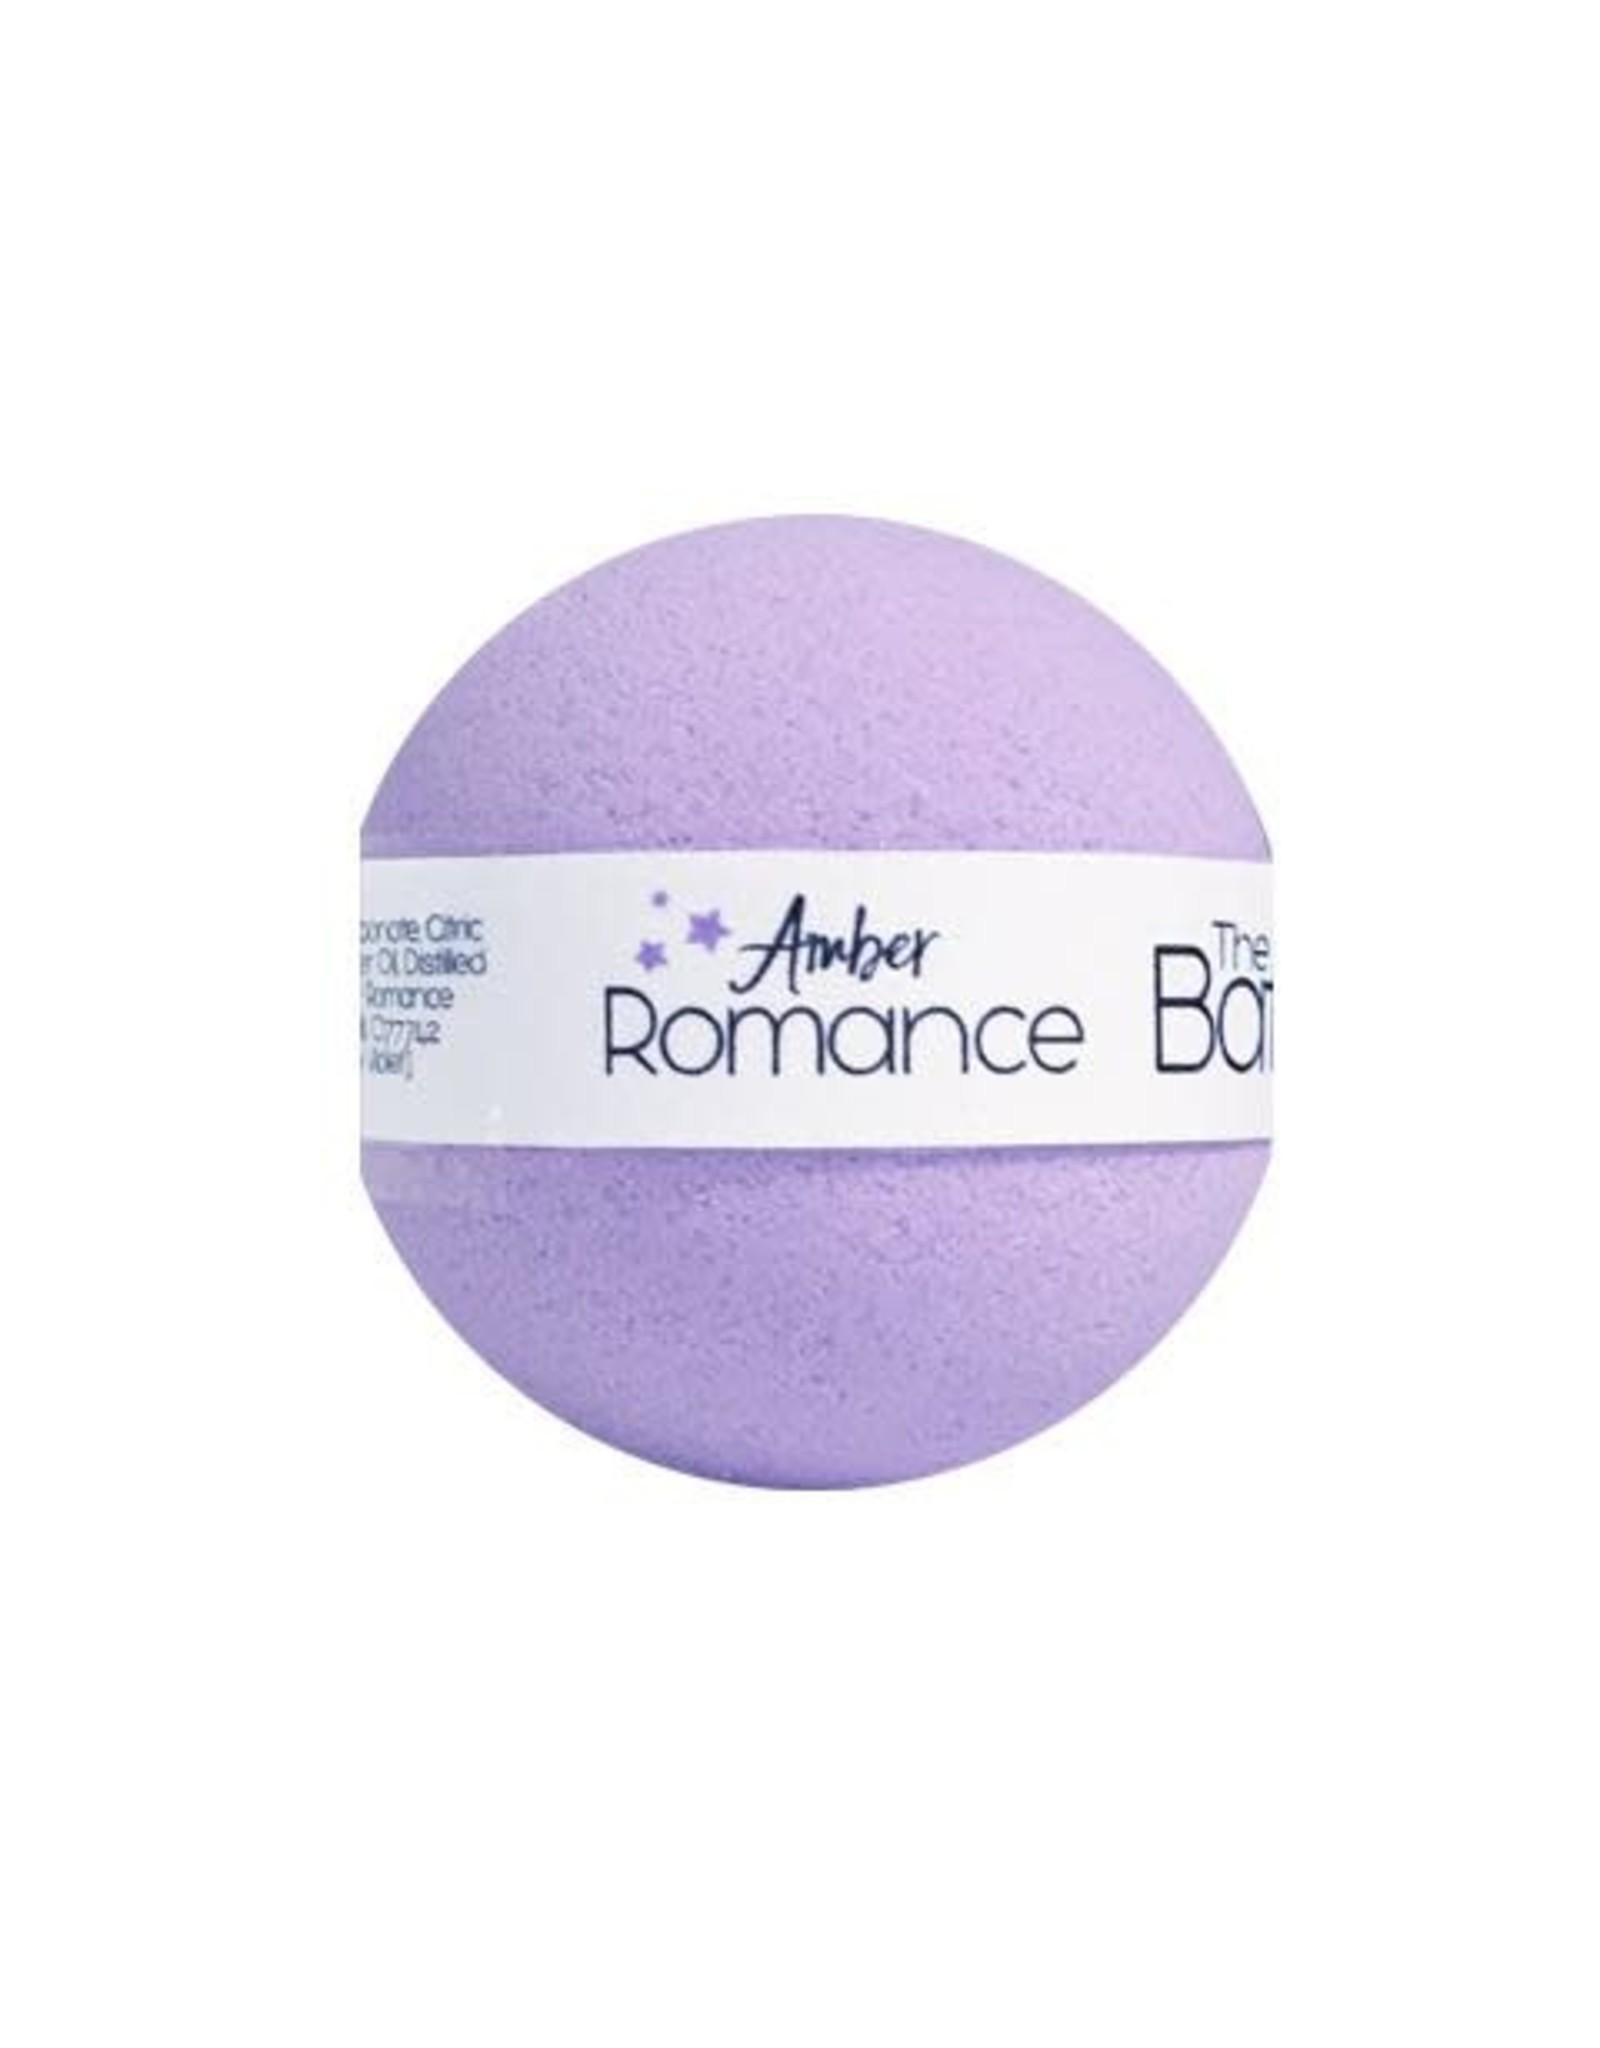 The Bath Bomb Co Bath Bomb Mini - Amber Romance - 95 g